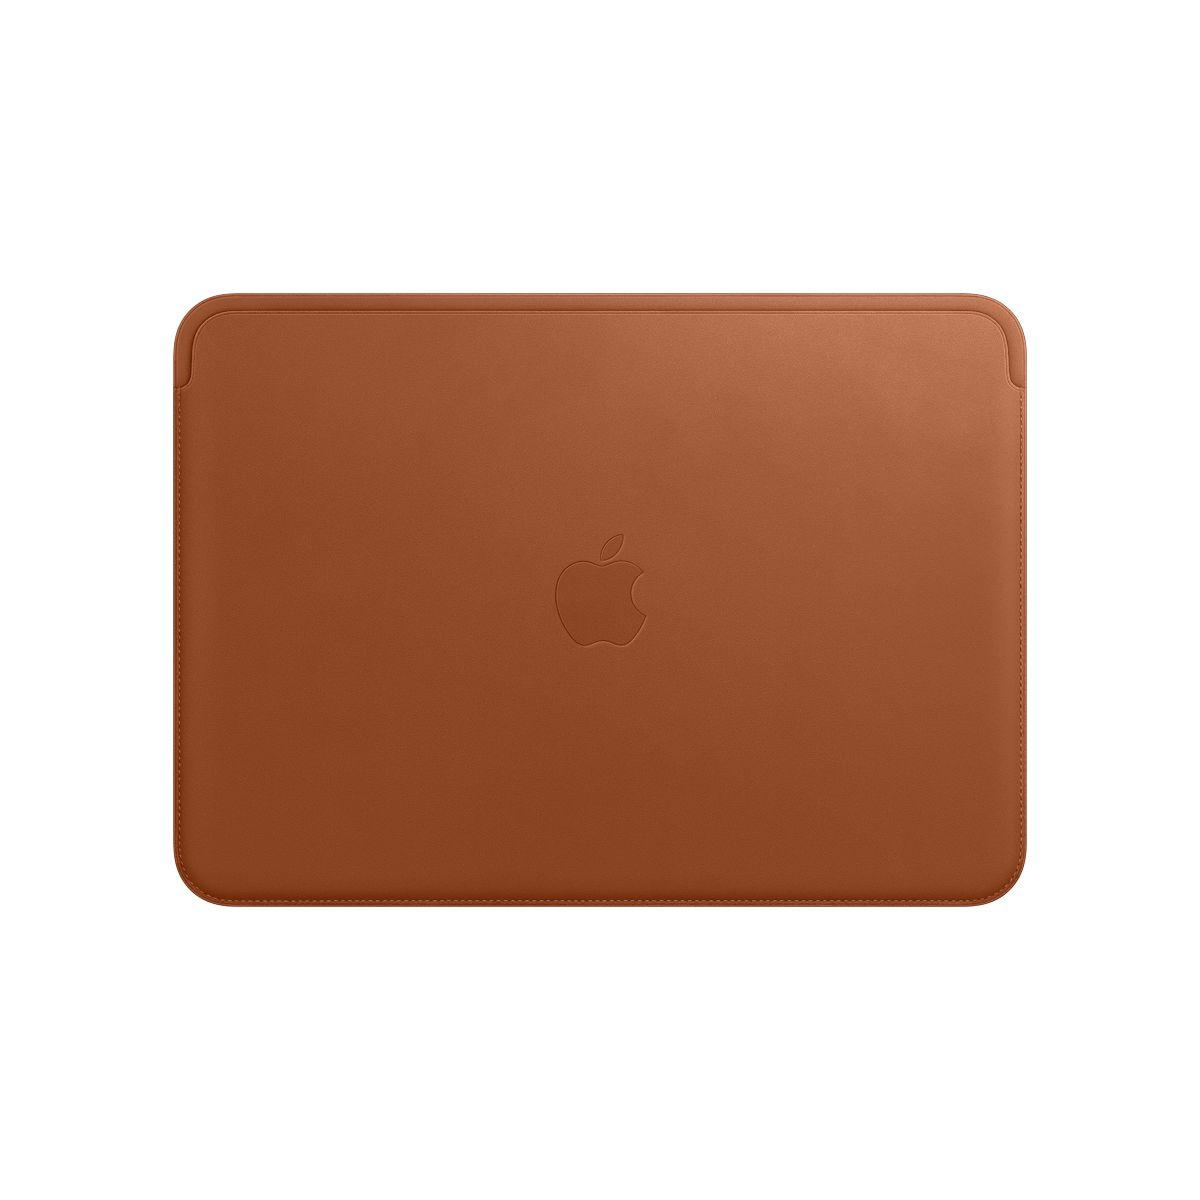 Housse apple macbook 12'' cuir havane - livraison offerte : code liv